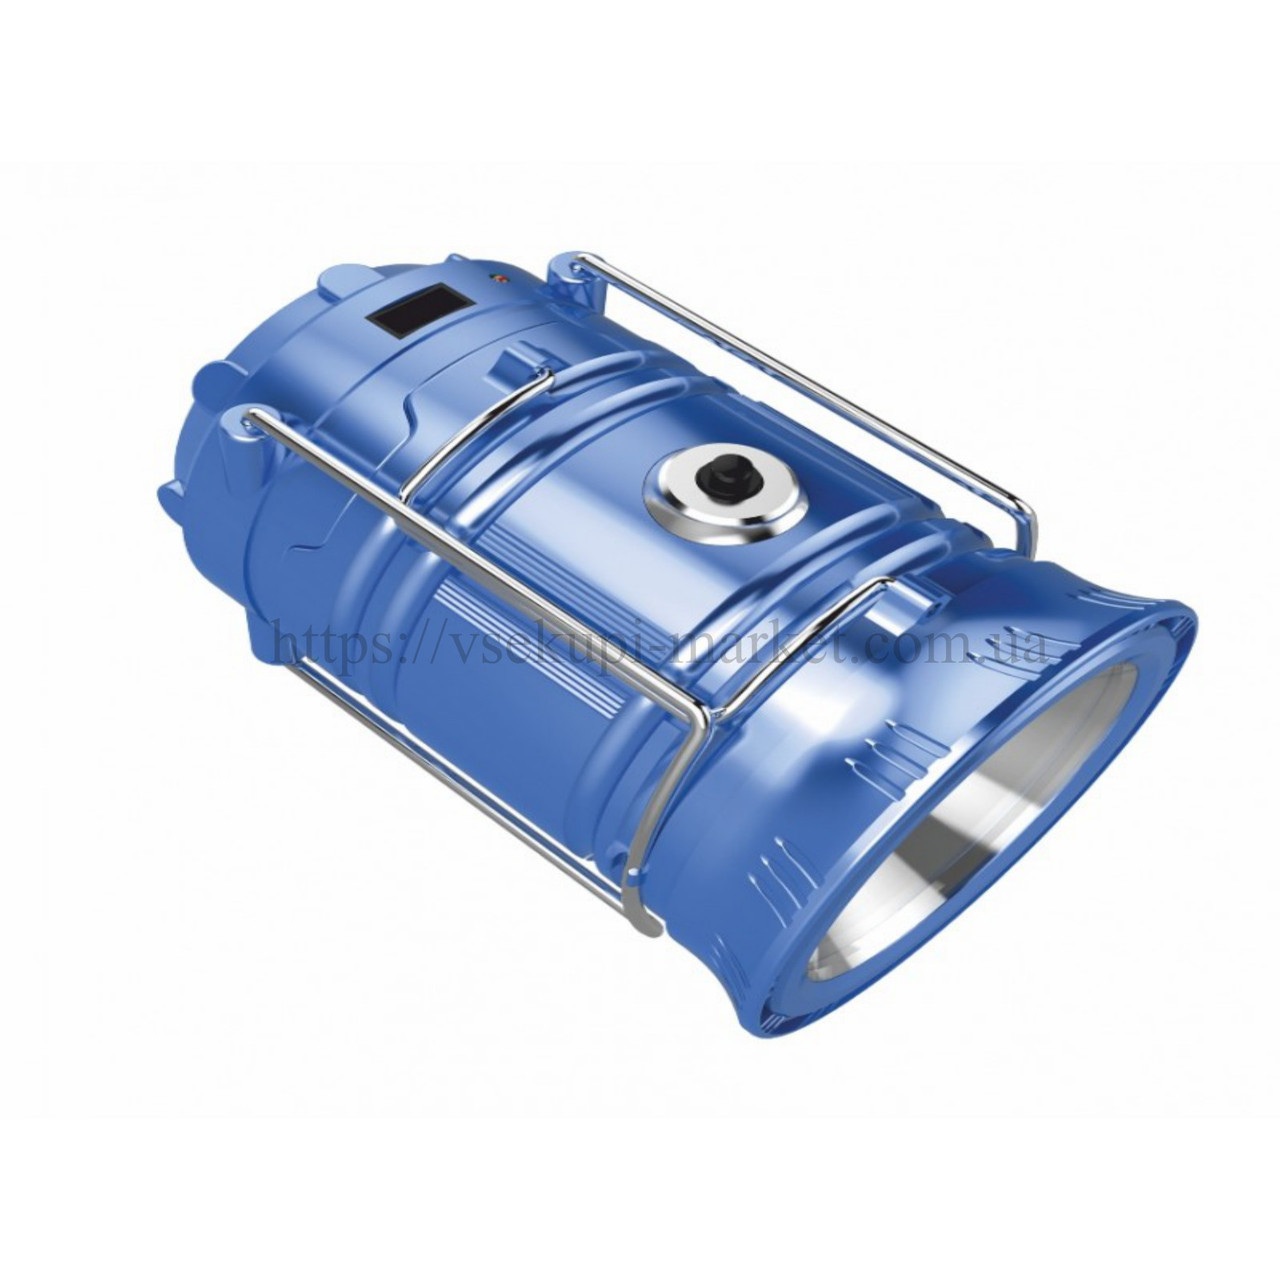 Фонарик RIGHT HAUSEN ALEX 350MAH 1W + 5 SMD LED HN-314014